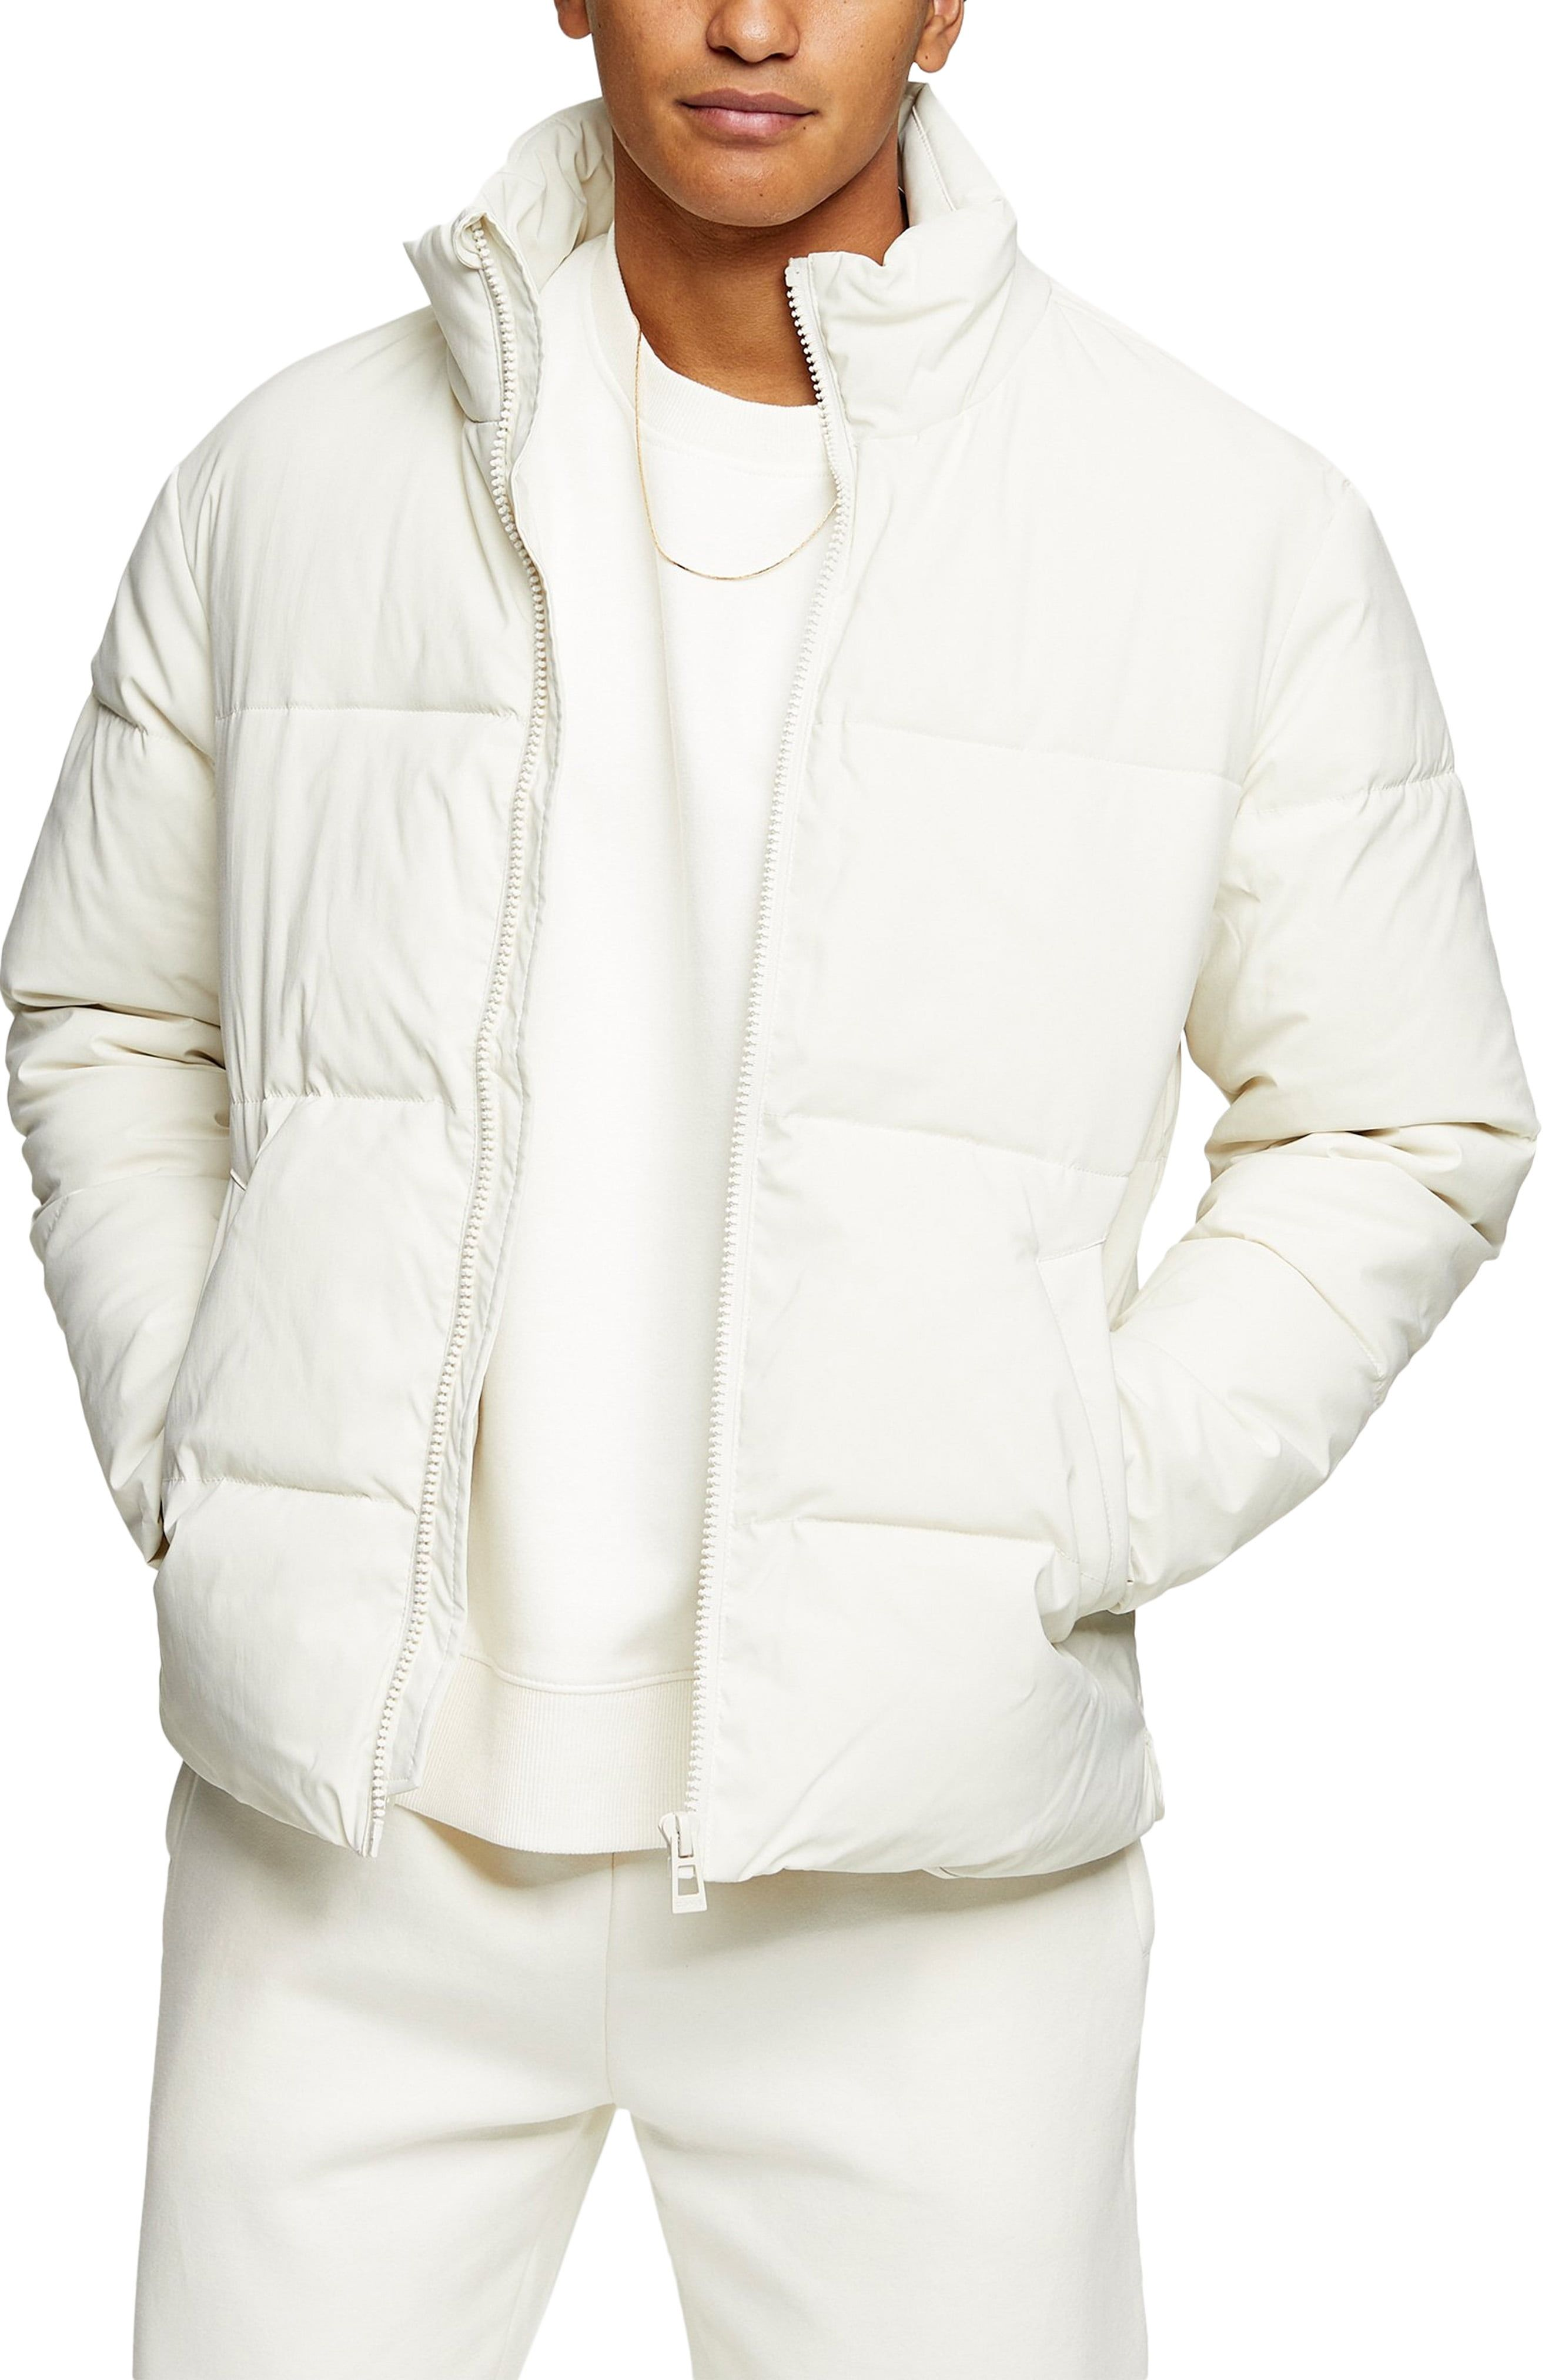 Topman Lucky Puffer Jacket Nordstrom In 2021 Best Puffer Jacket Mens Puffer Jacket Puffer Jacket Outfit [ 4048 x 2640 Pixel ]